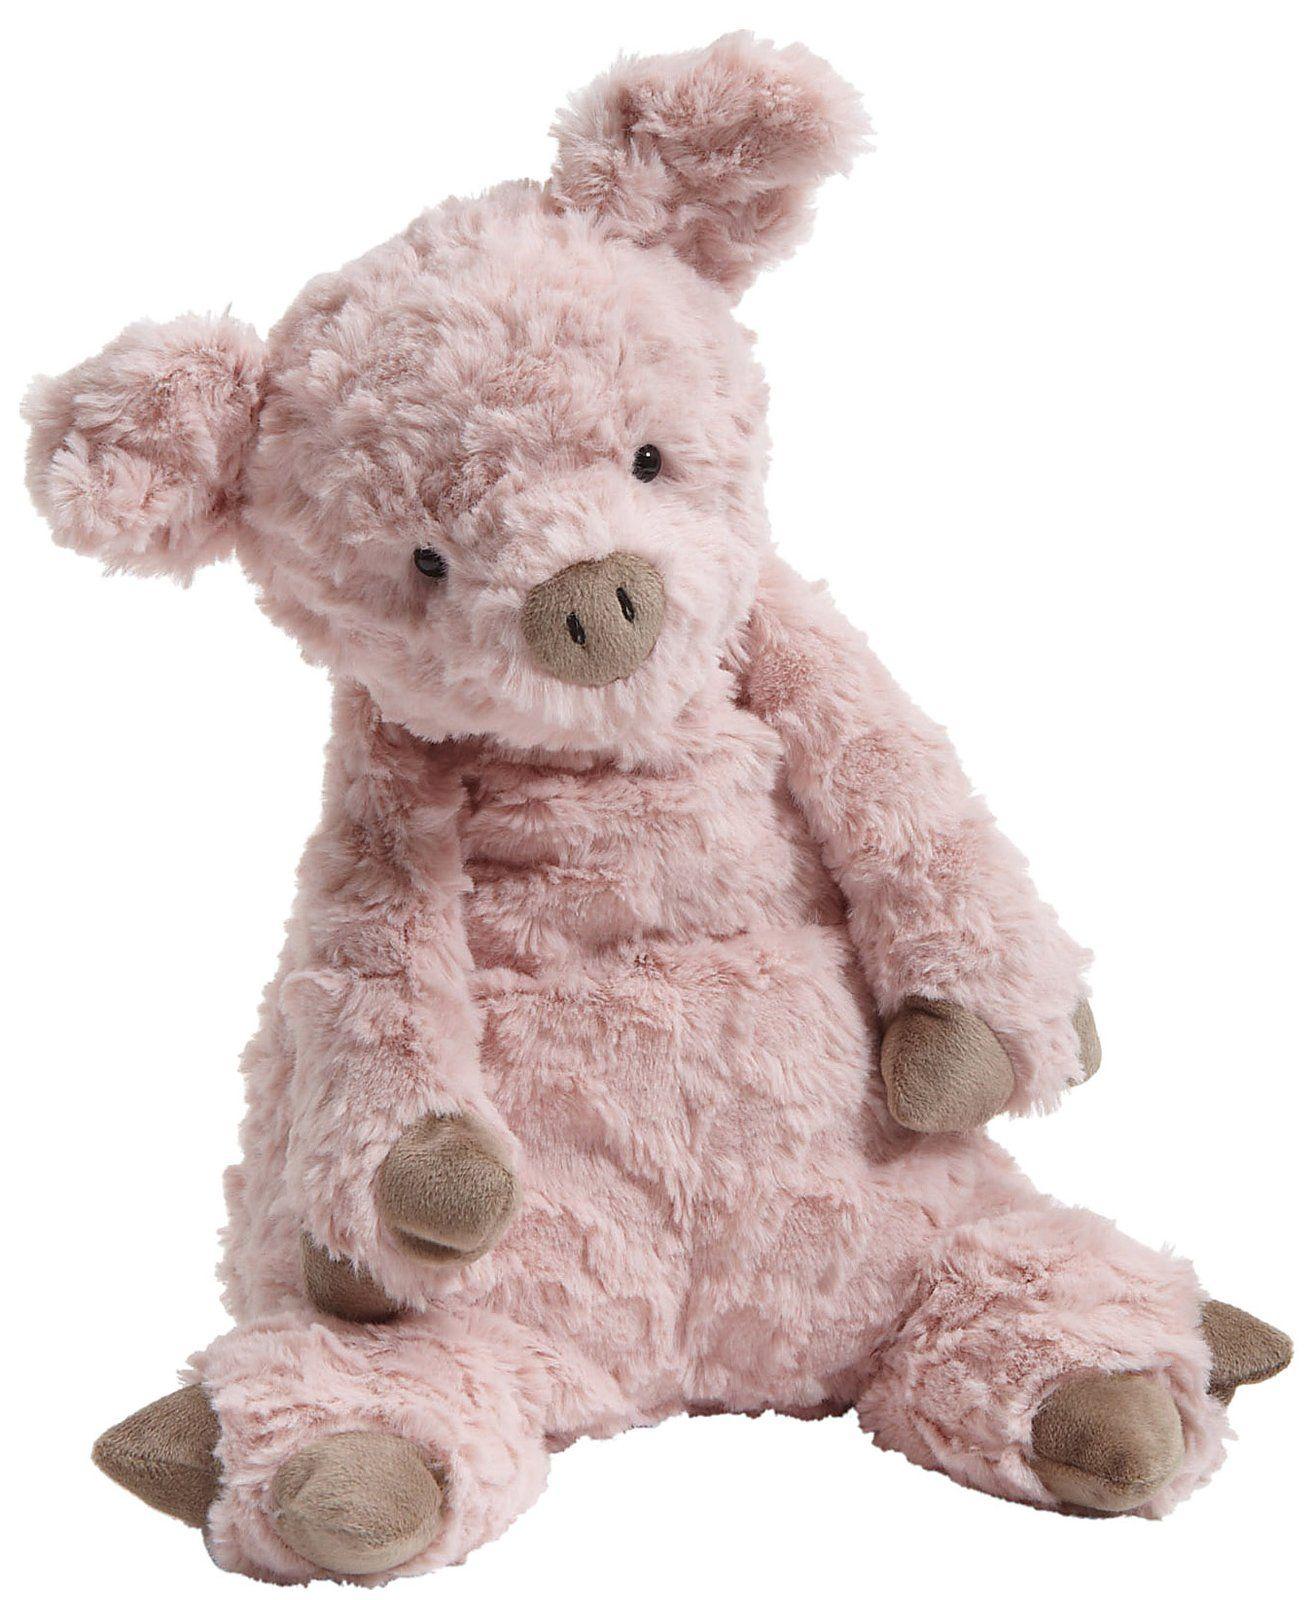 Jellycat Paloma Pig Jellycat Nursery Accessories Baby Toys